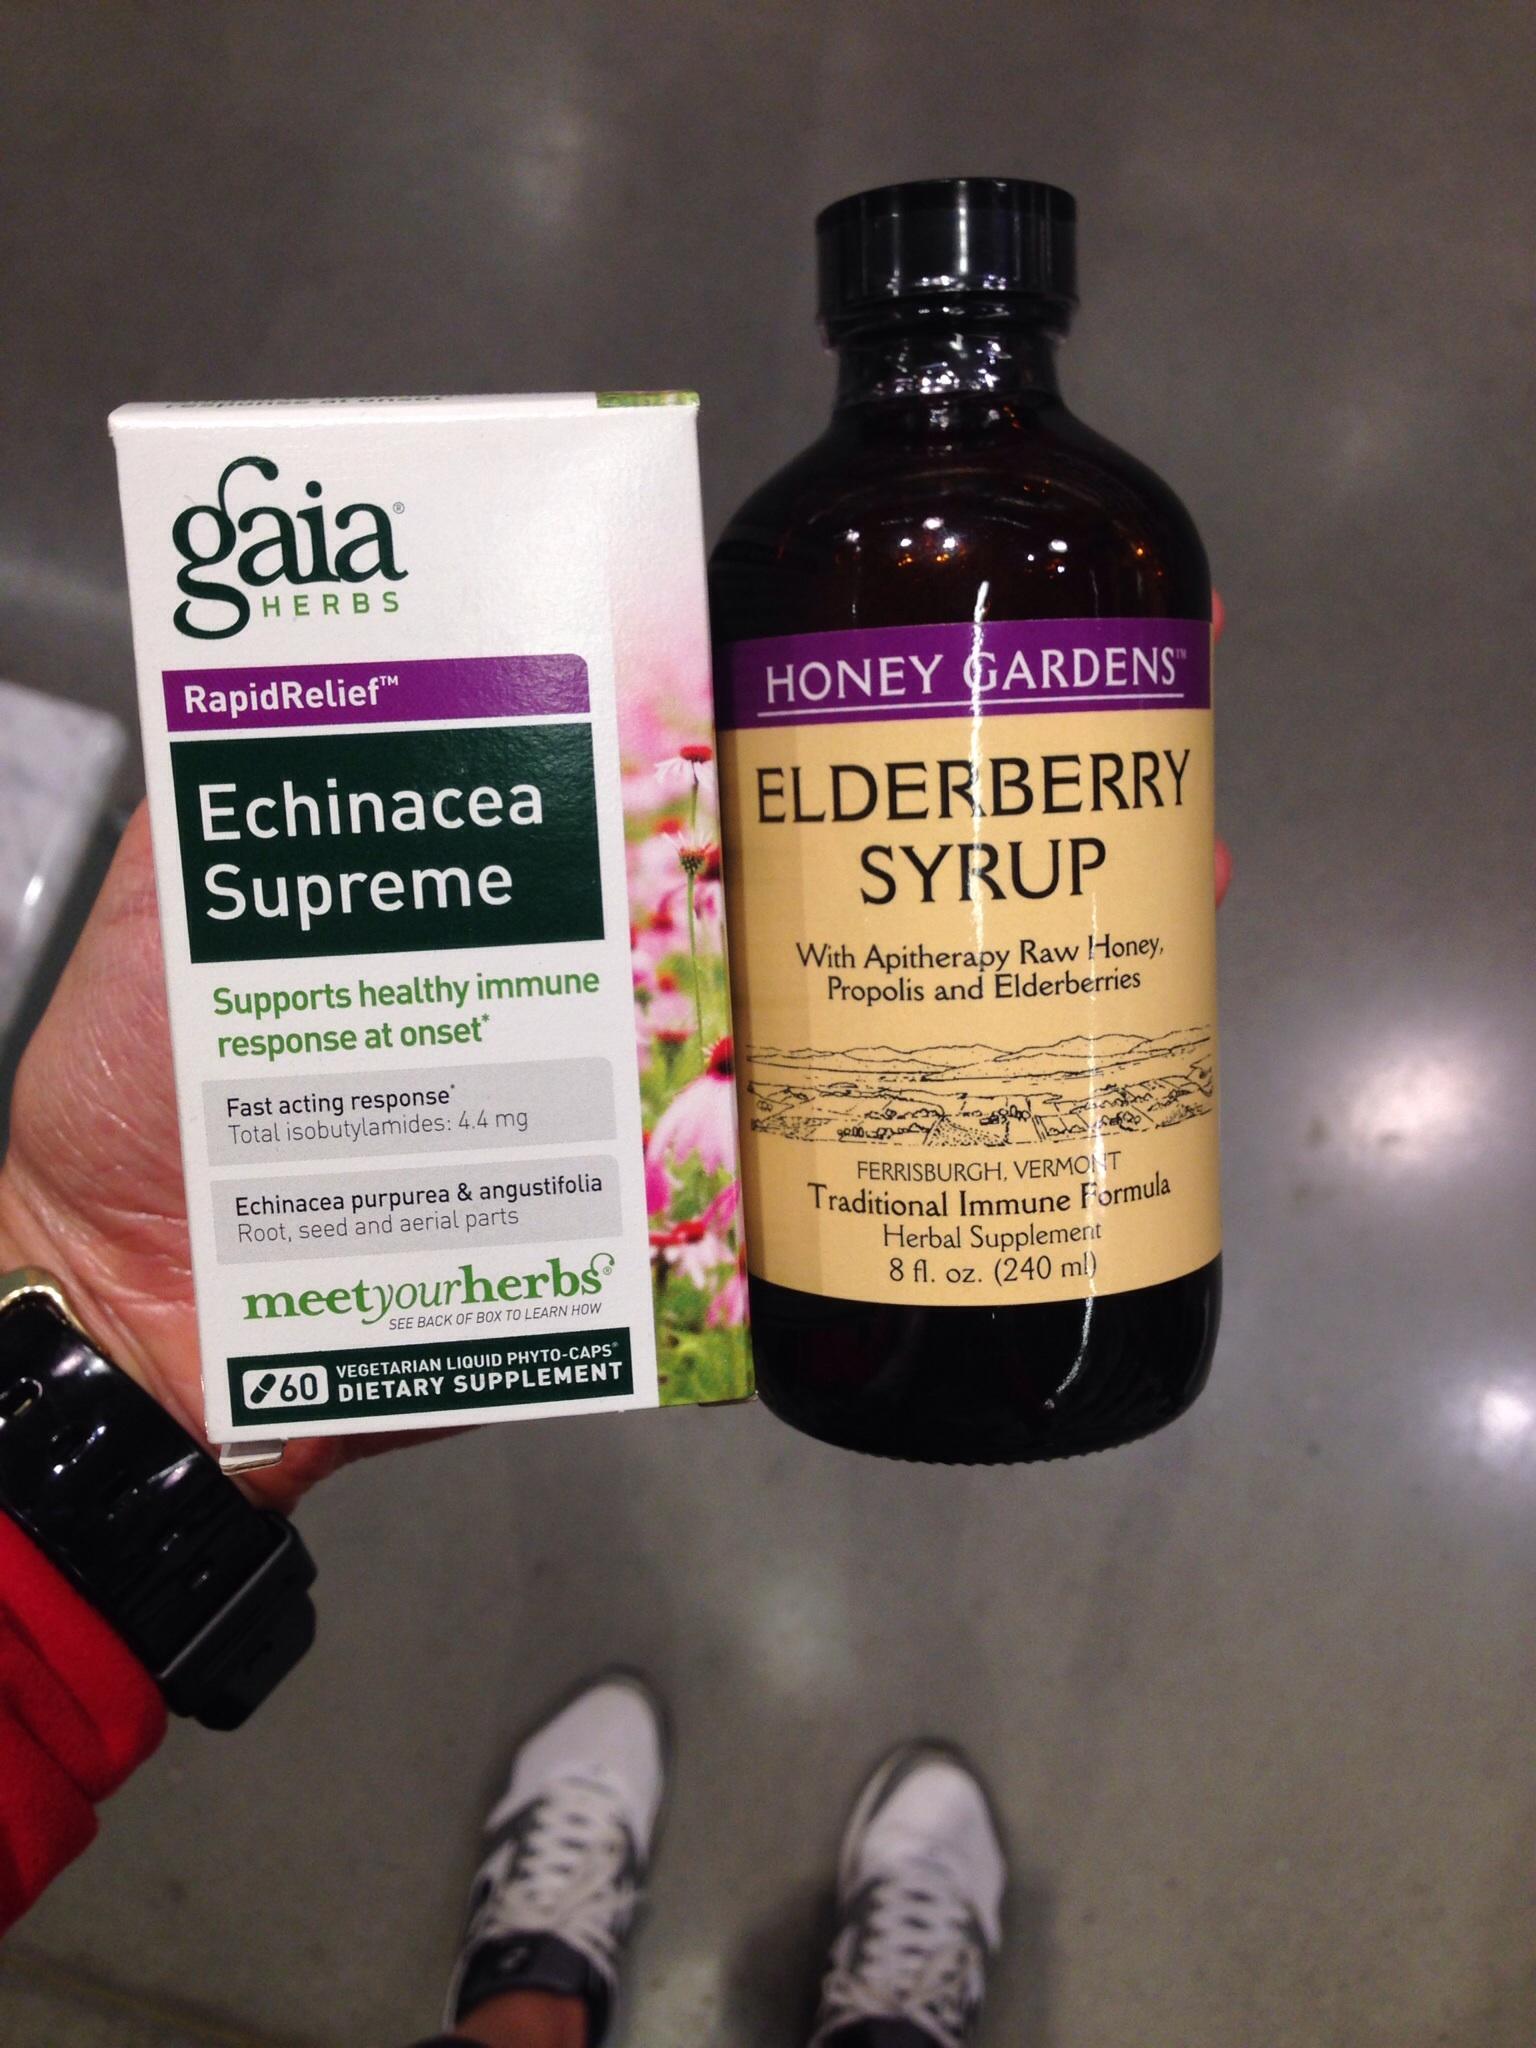 Echinacea + Elderberry Syrup